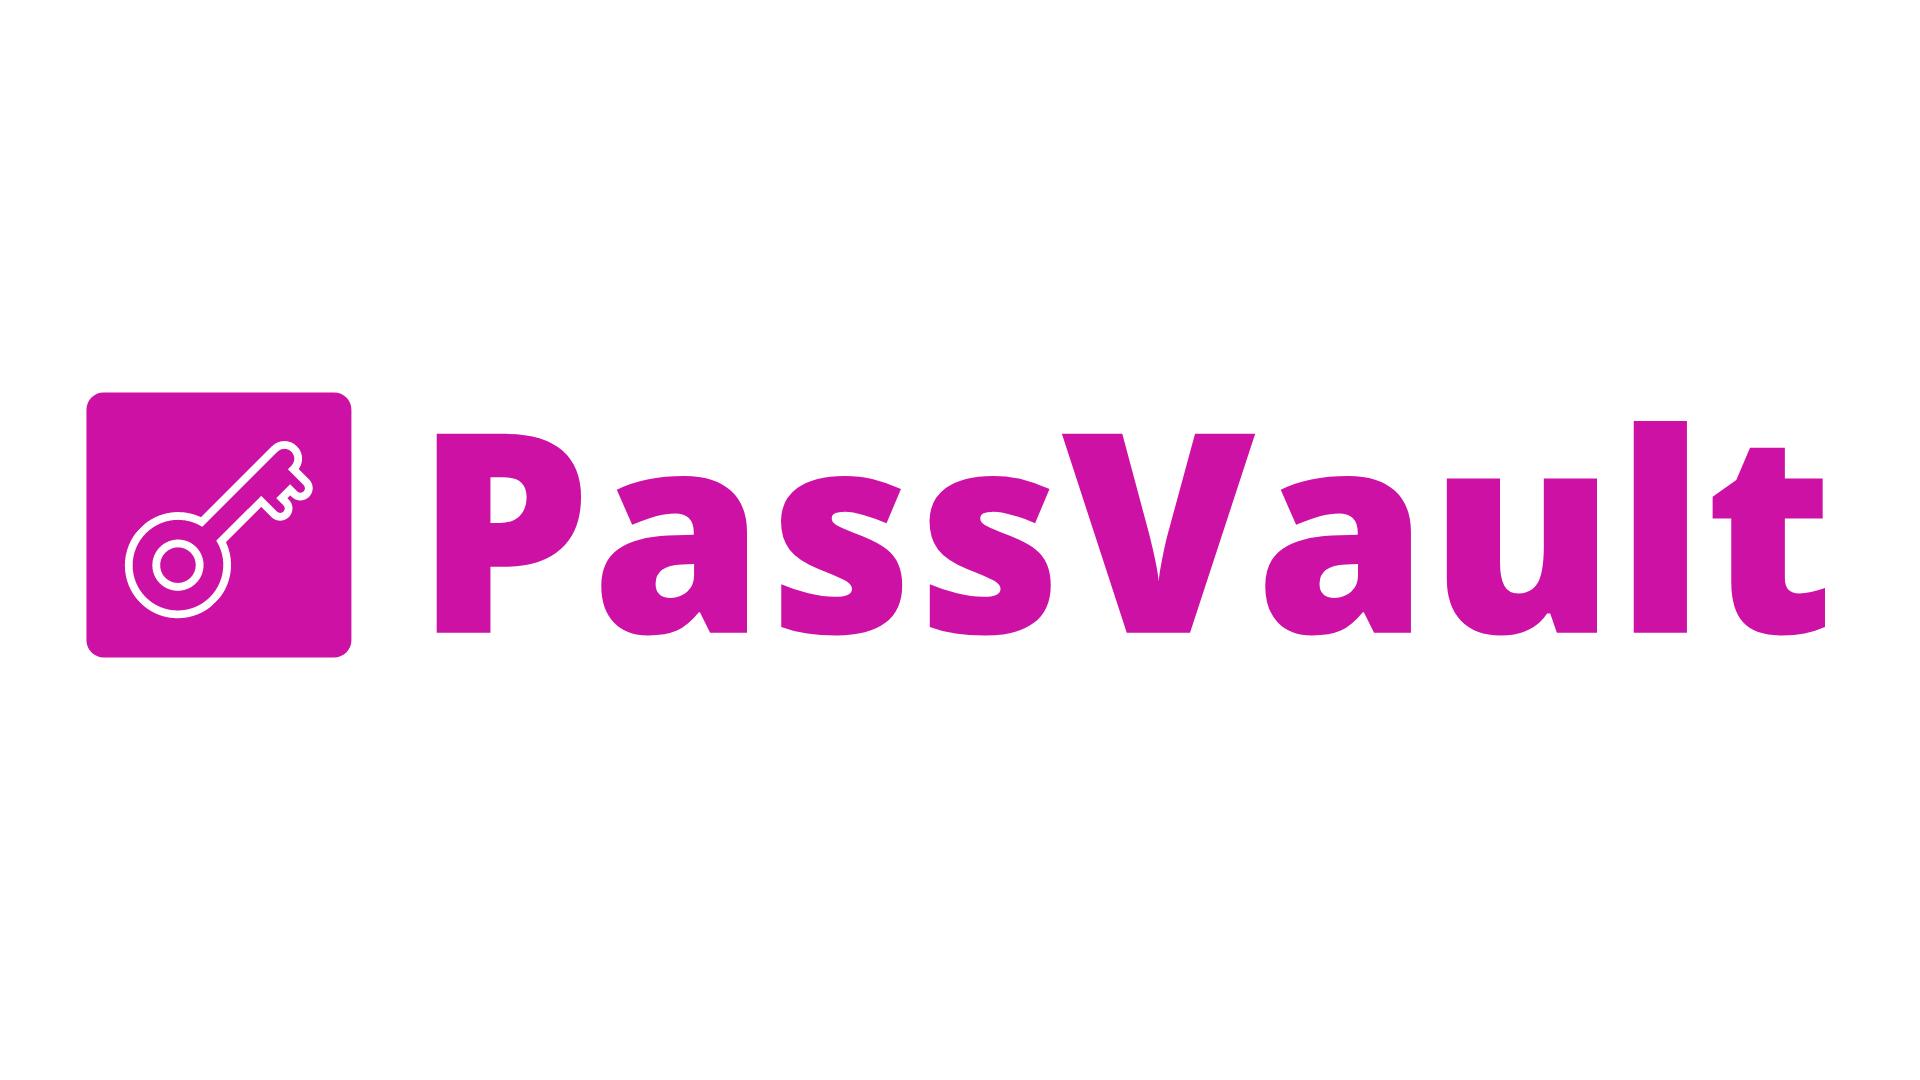 PassVault showcase